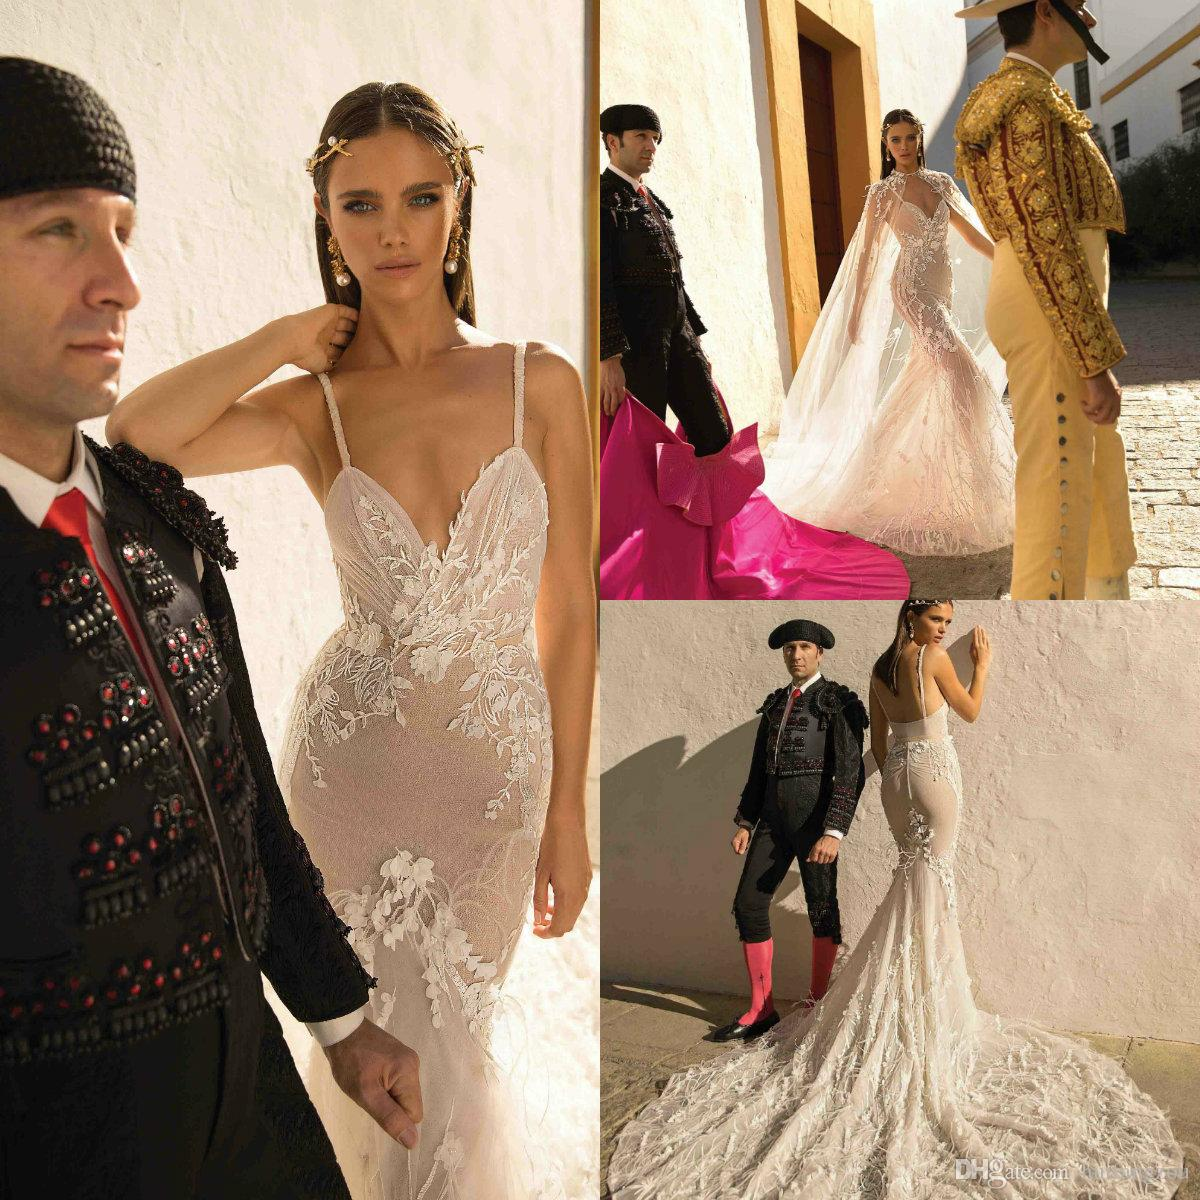 Berta Illusion Mermaid Abiti da sposa 2018 Spaghetti Lace Applique Feathers Abiti da sposa Custom Made Sweep Train Wedding Dress With Wrap